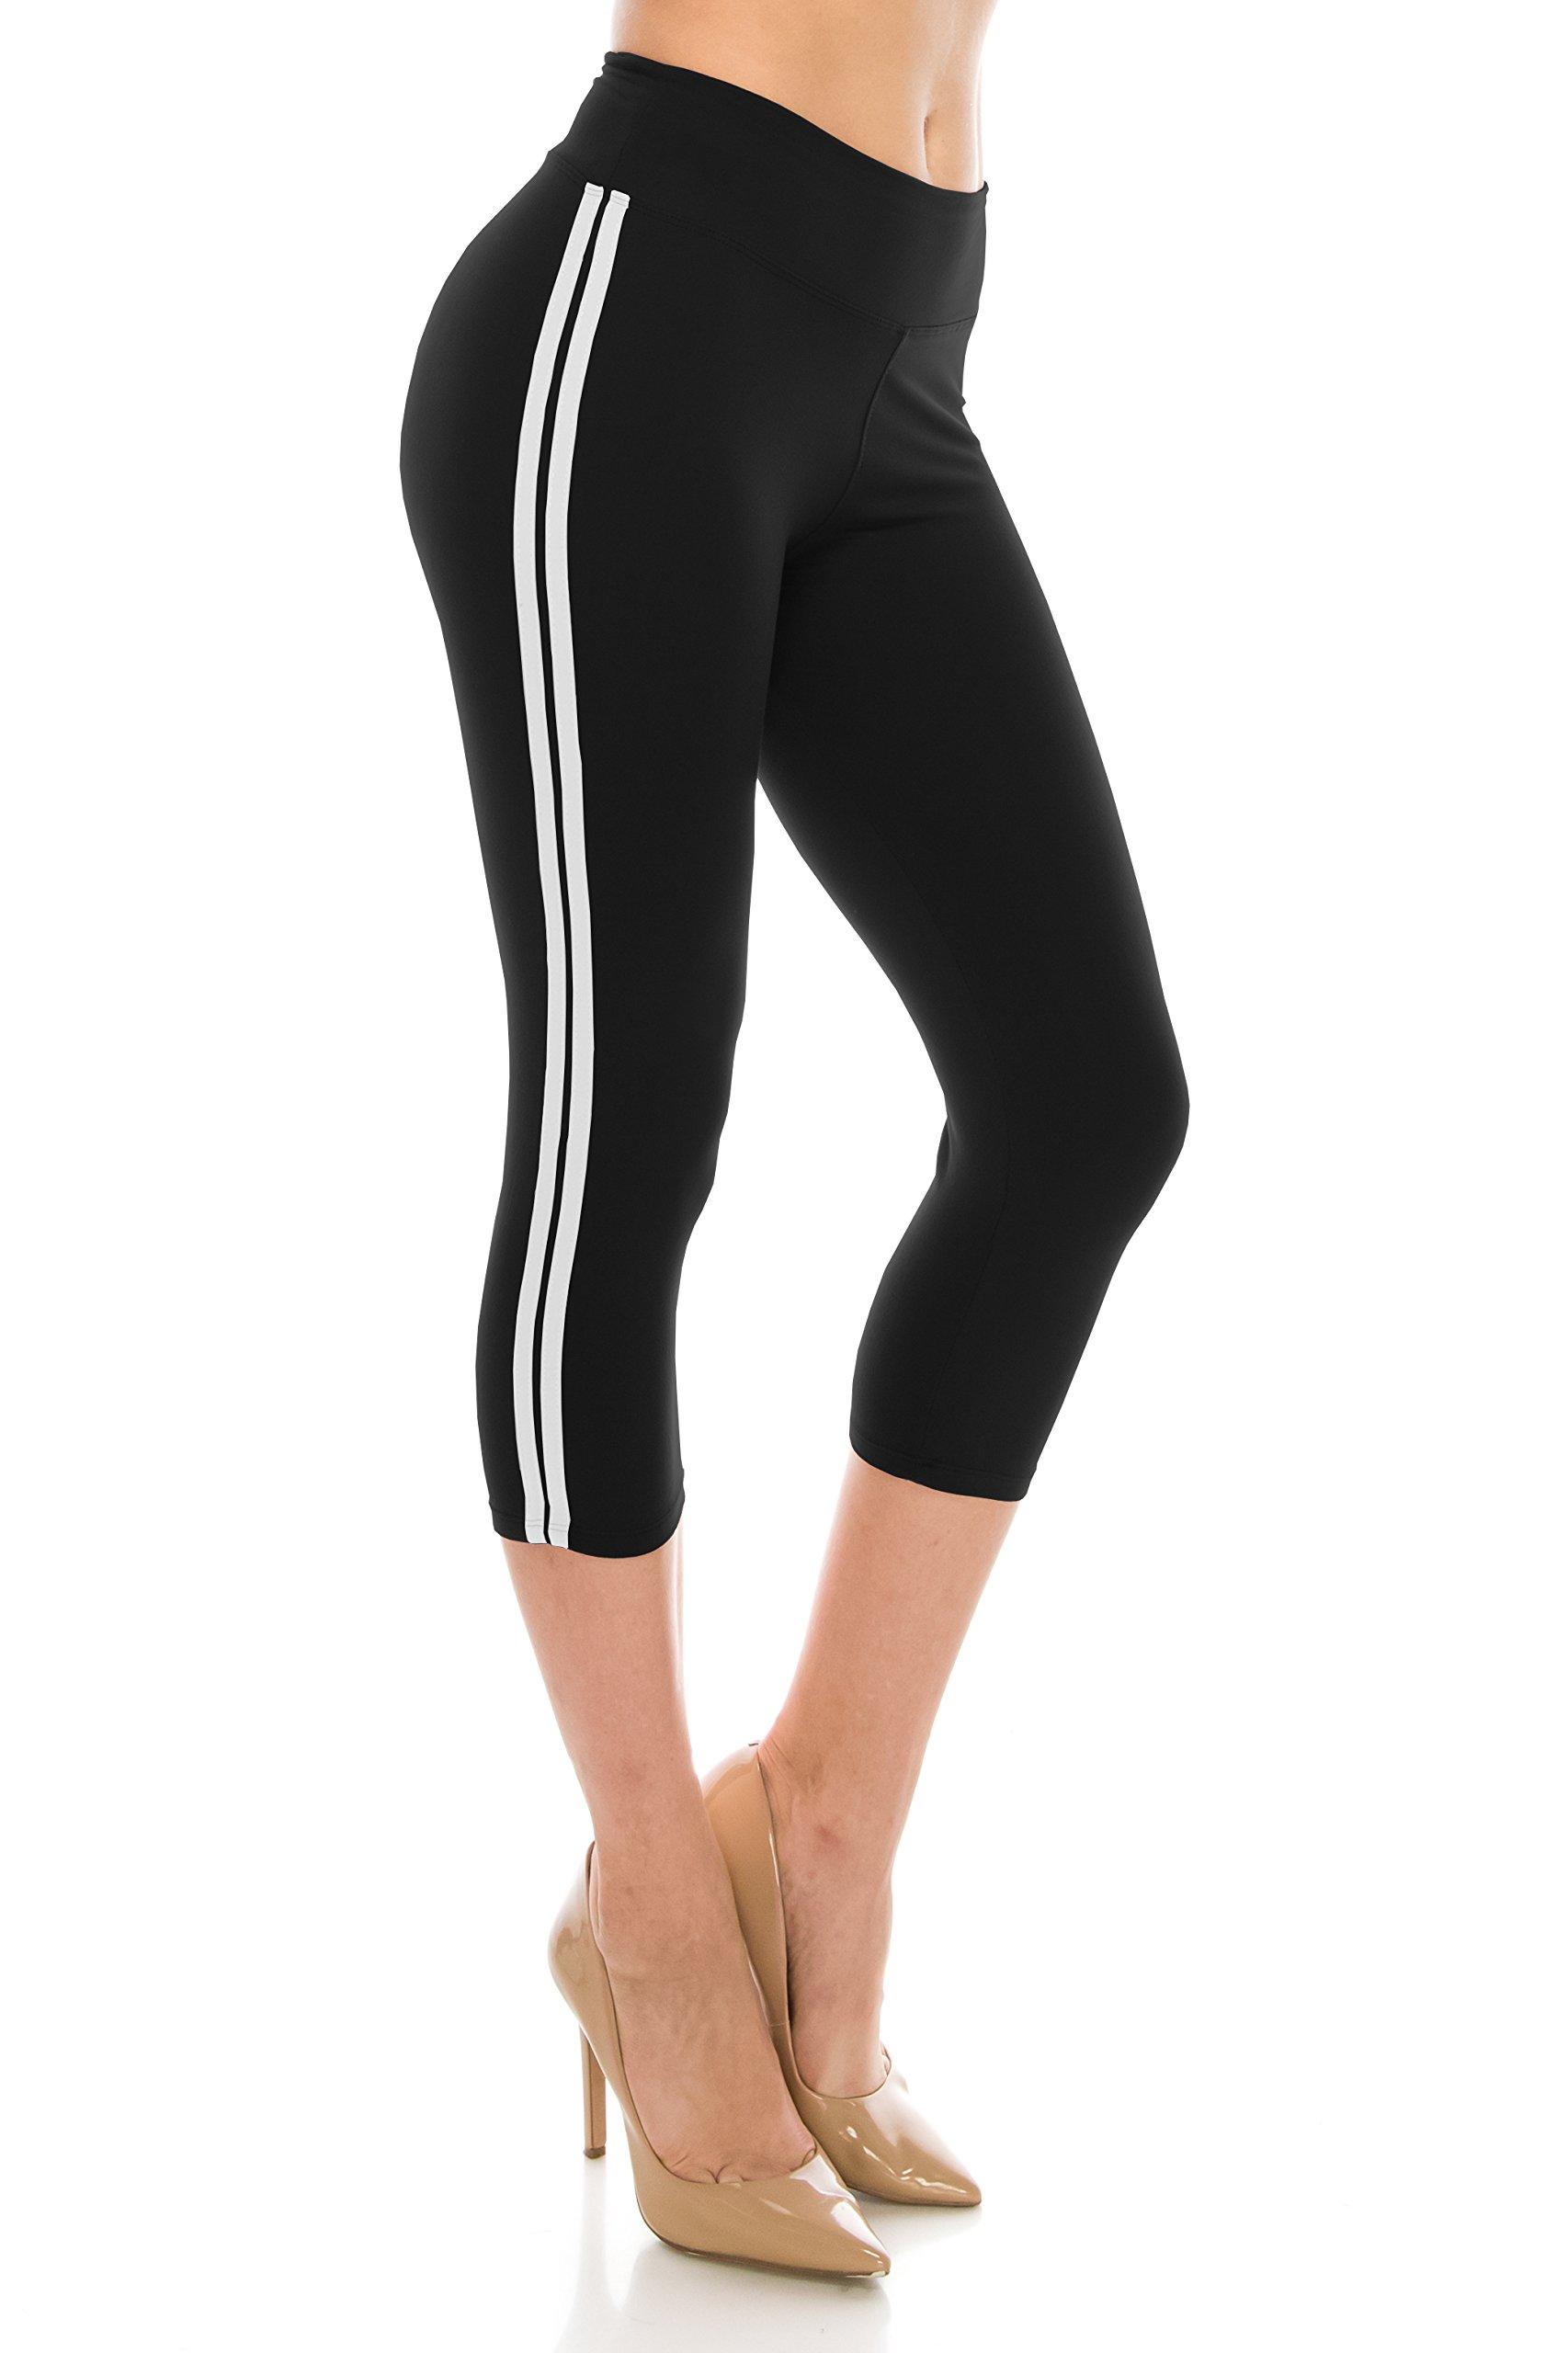 ALWAYS Leggings Women Striped Capri - Basic Premium Soft Stretch Buttery Yoga Workout Black White Plus